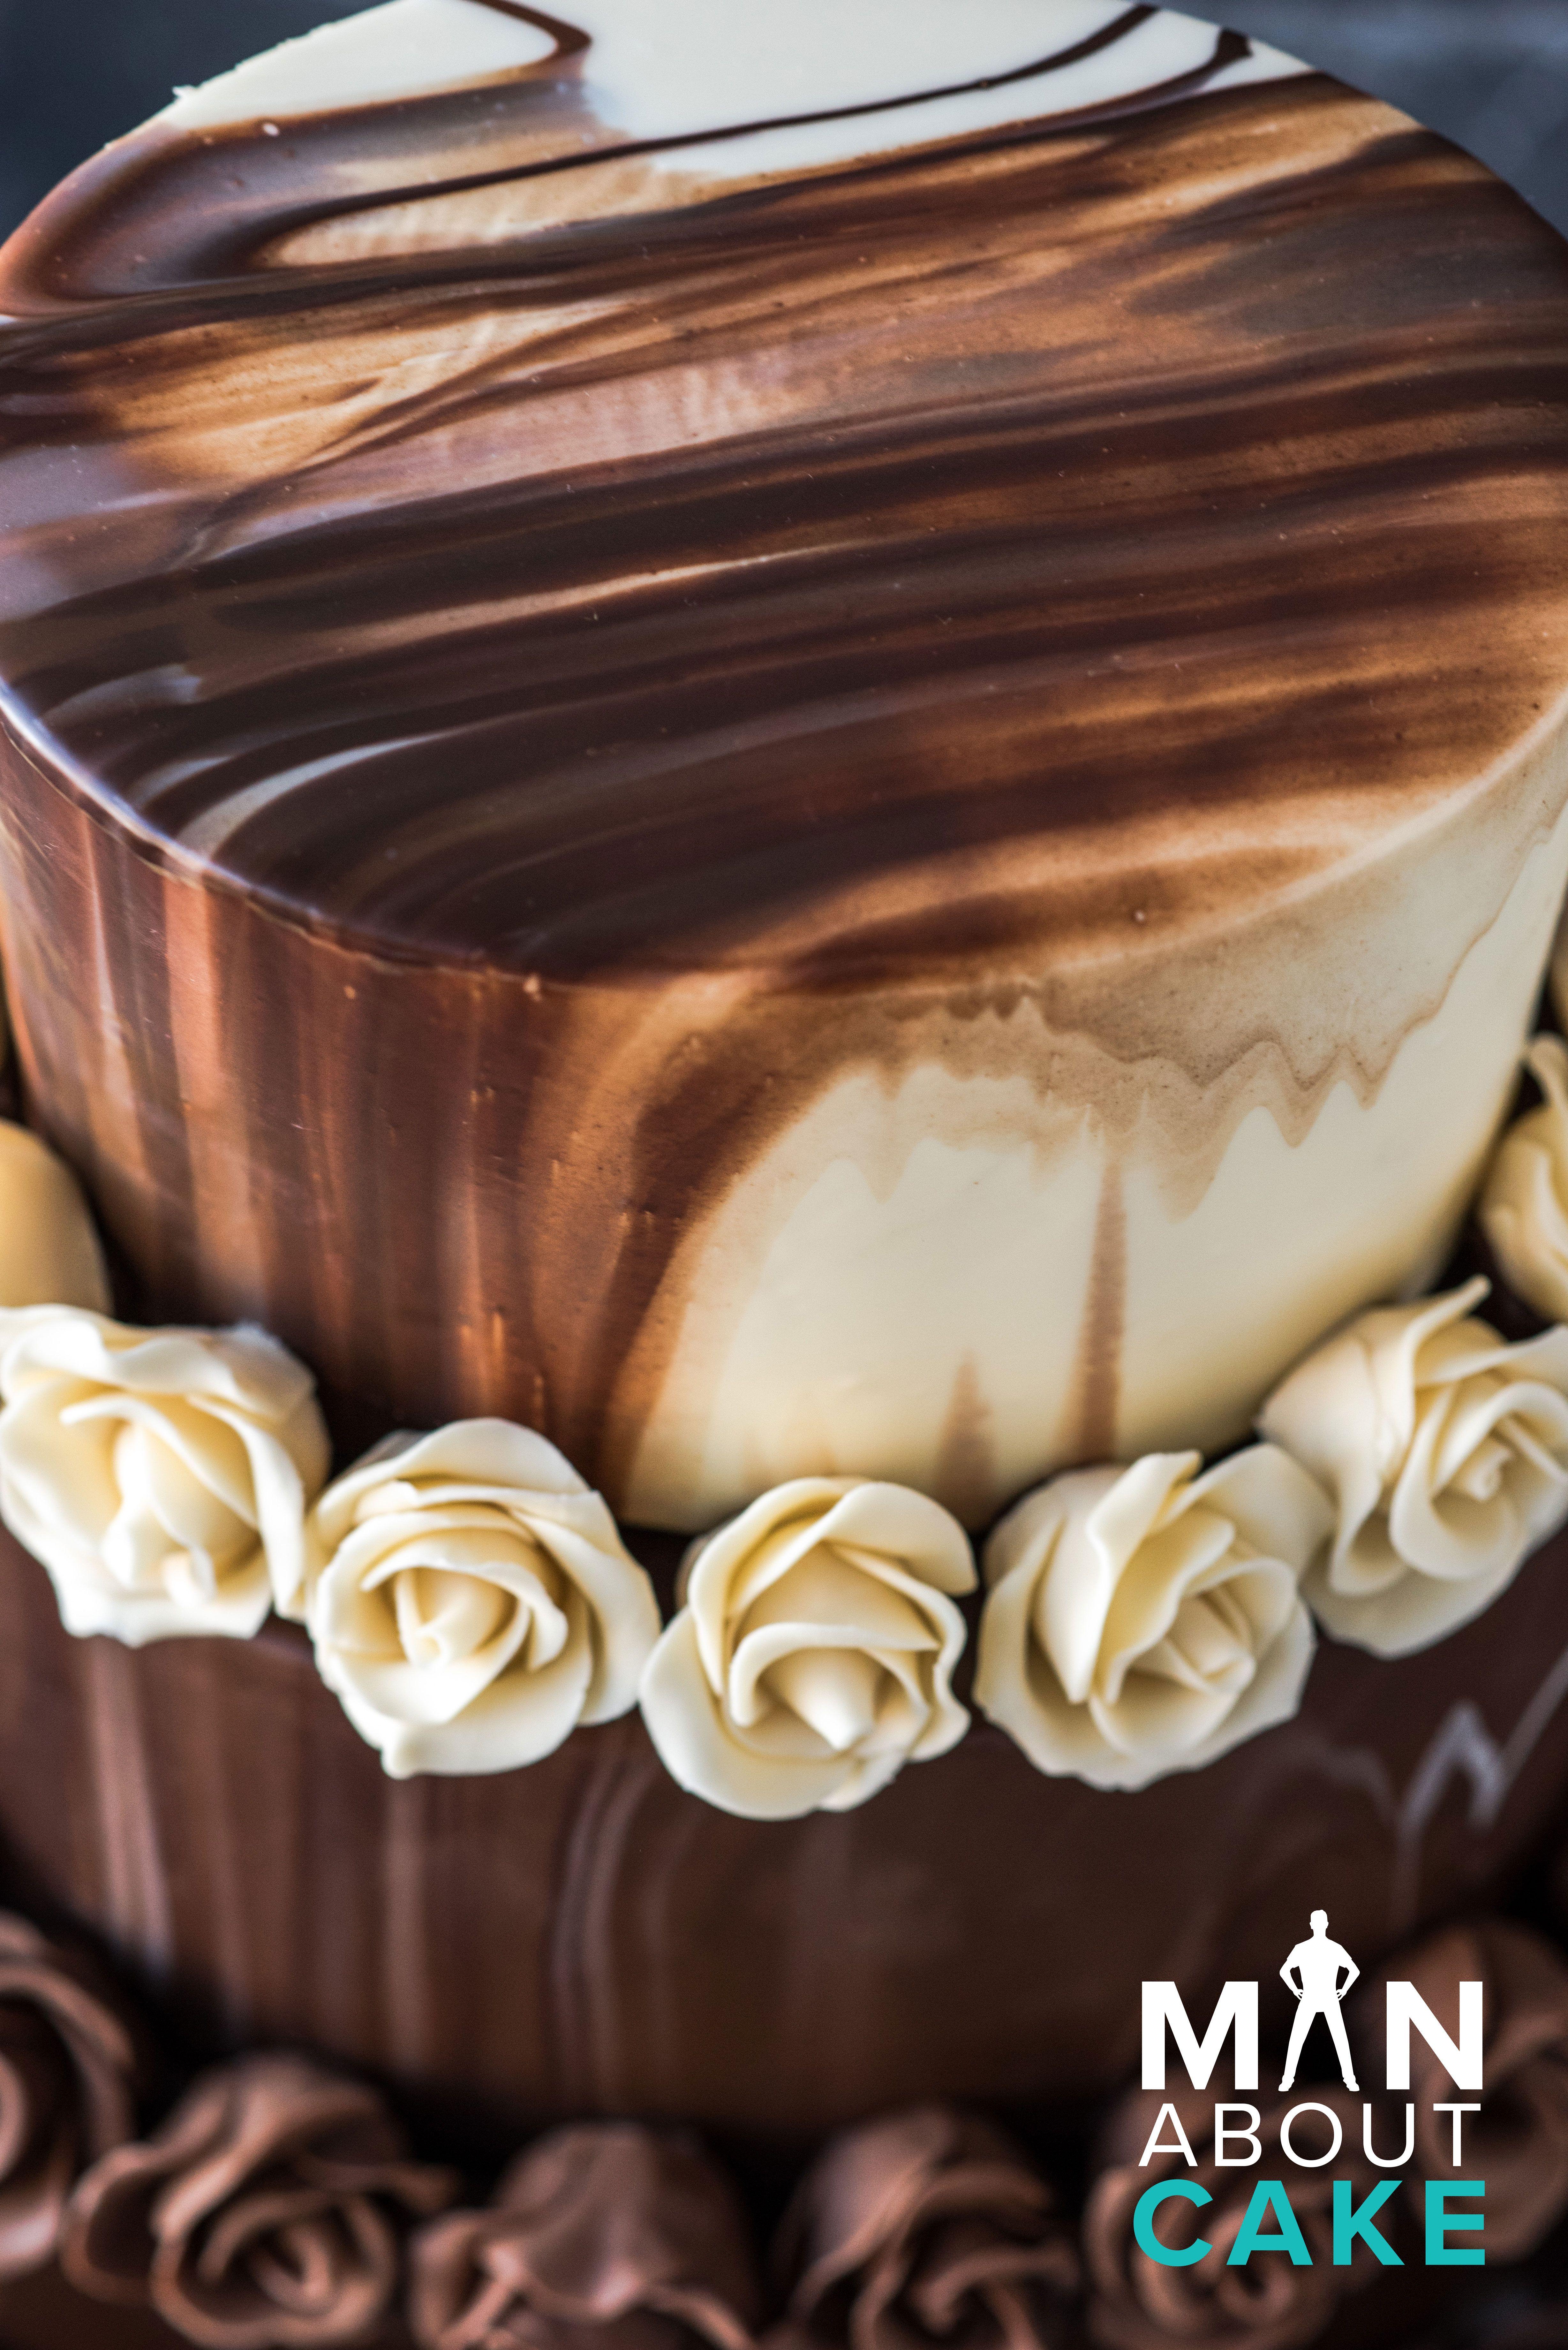 Chocolate Ganache Modeling Chocolate Roses By Joshua John Russell Chocolate Wedding With Images Chocolate Cake Decoration Chocolate Cake Designs Chocolate Ganache Cake